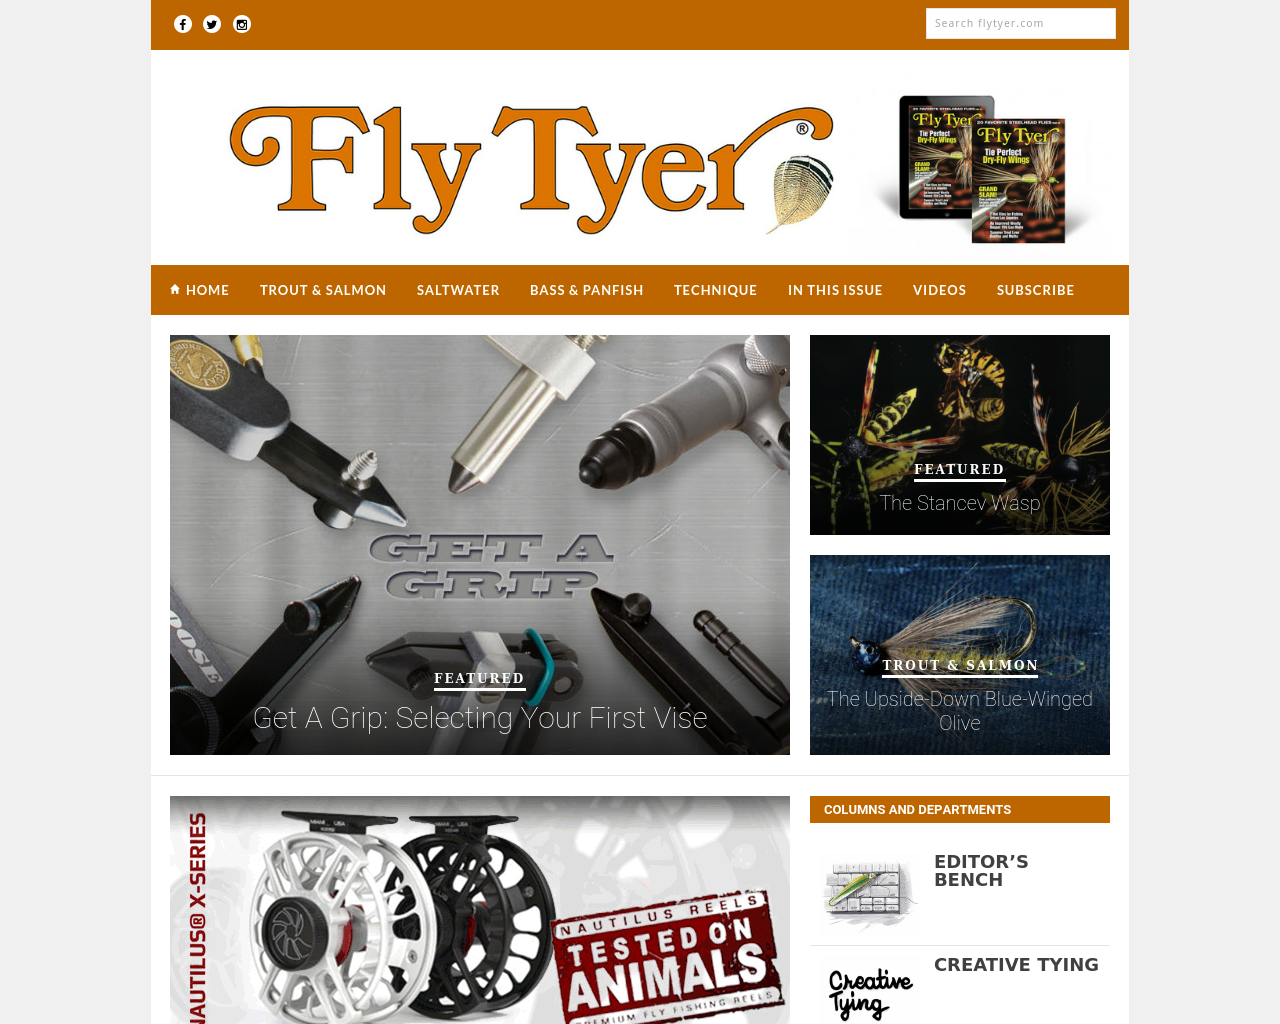 Flytyer.com-Advertising-Reviews-Pricing